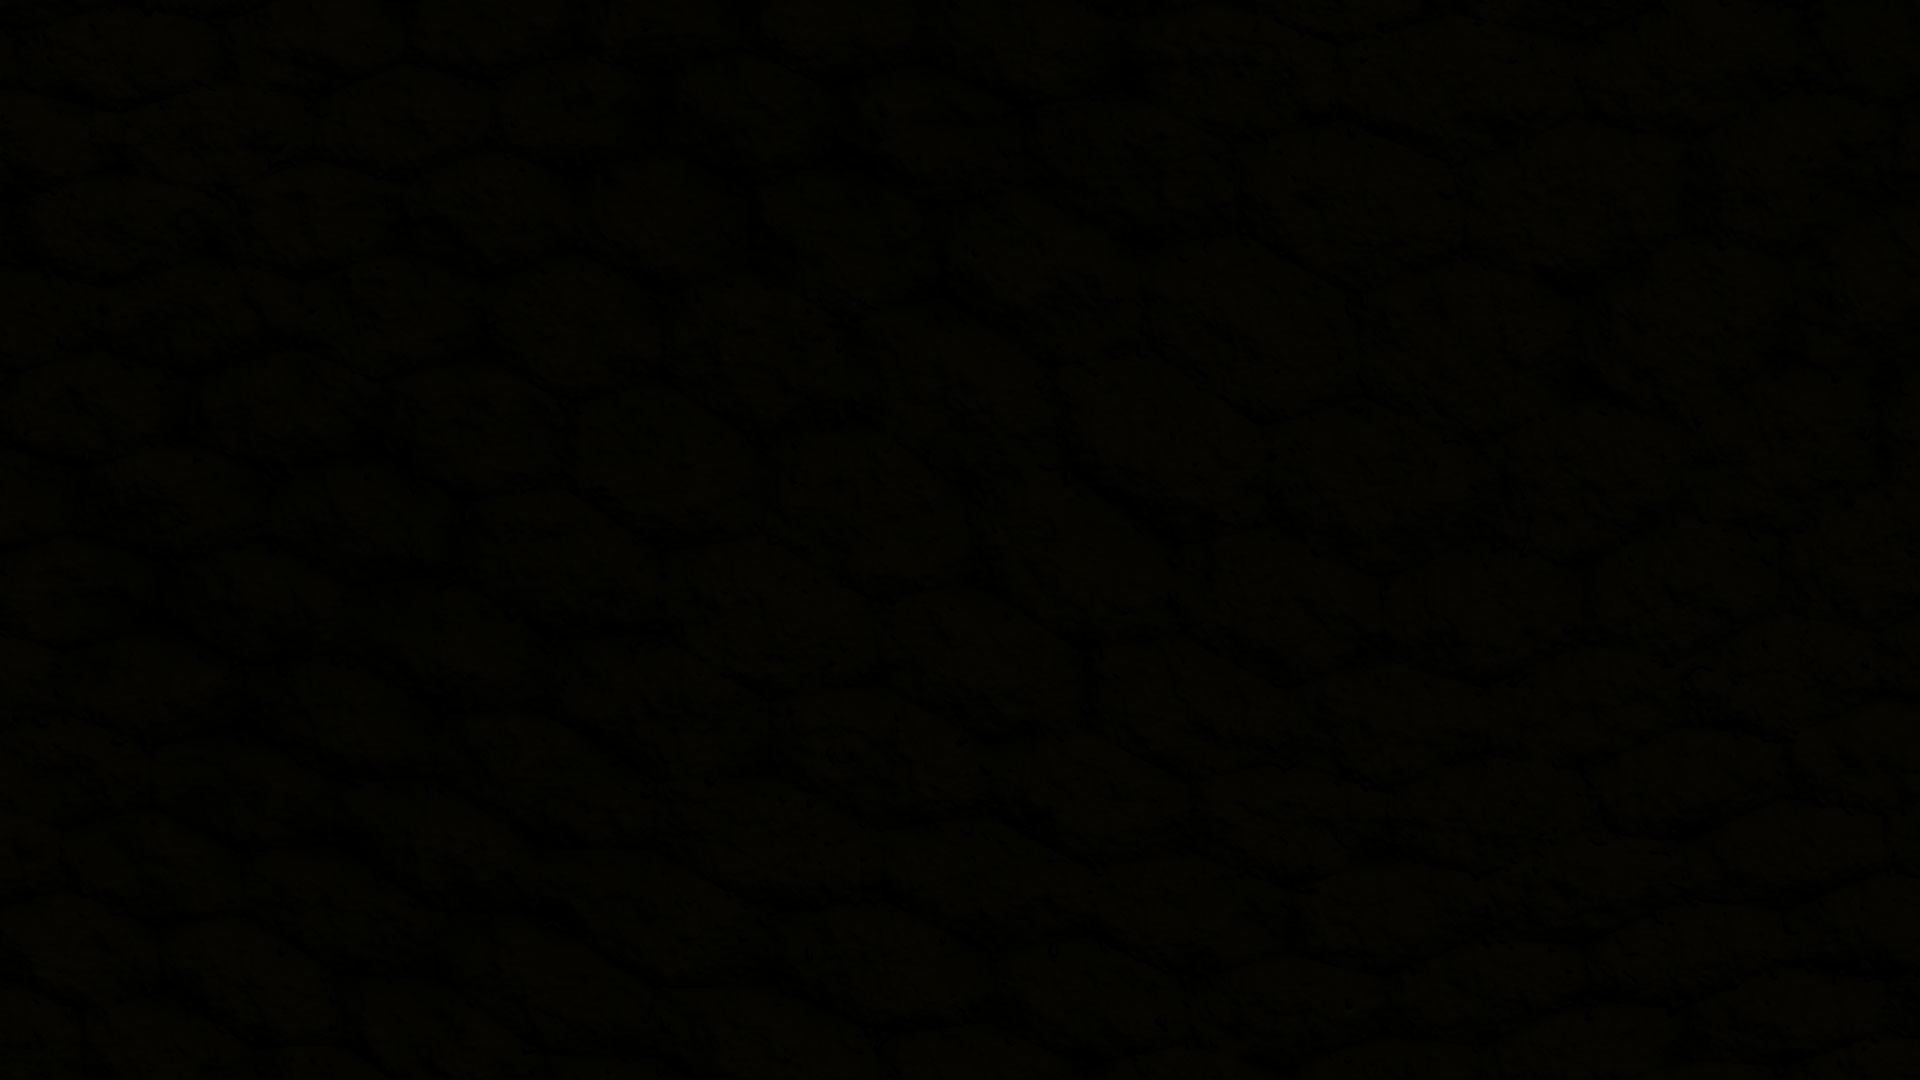 45+ Black Background Wallpaper 1920X1080 PNG